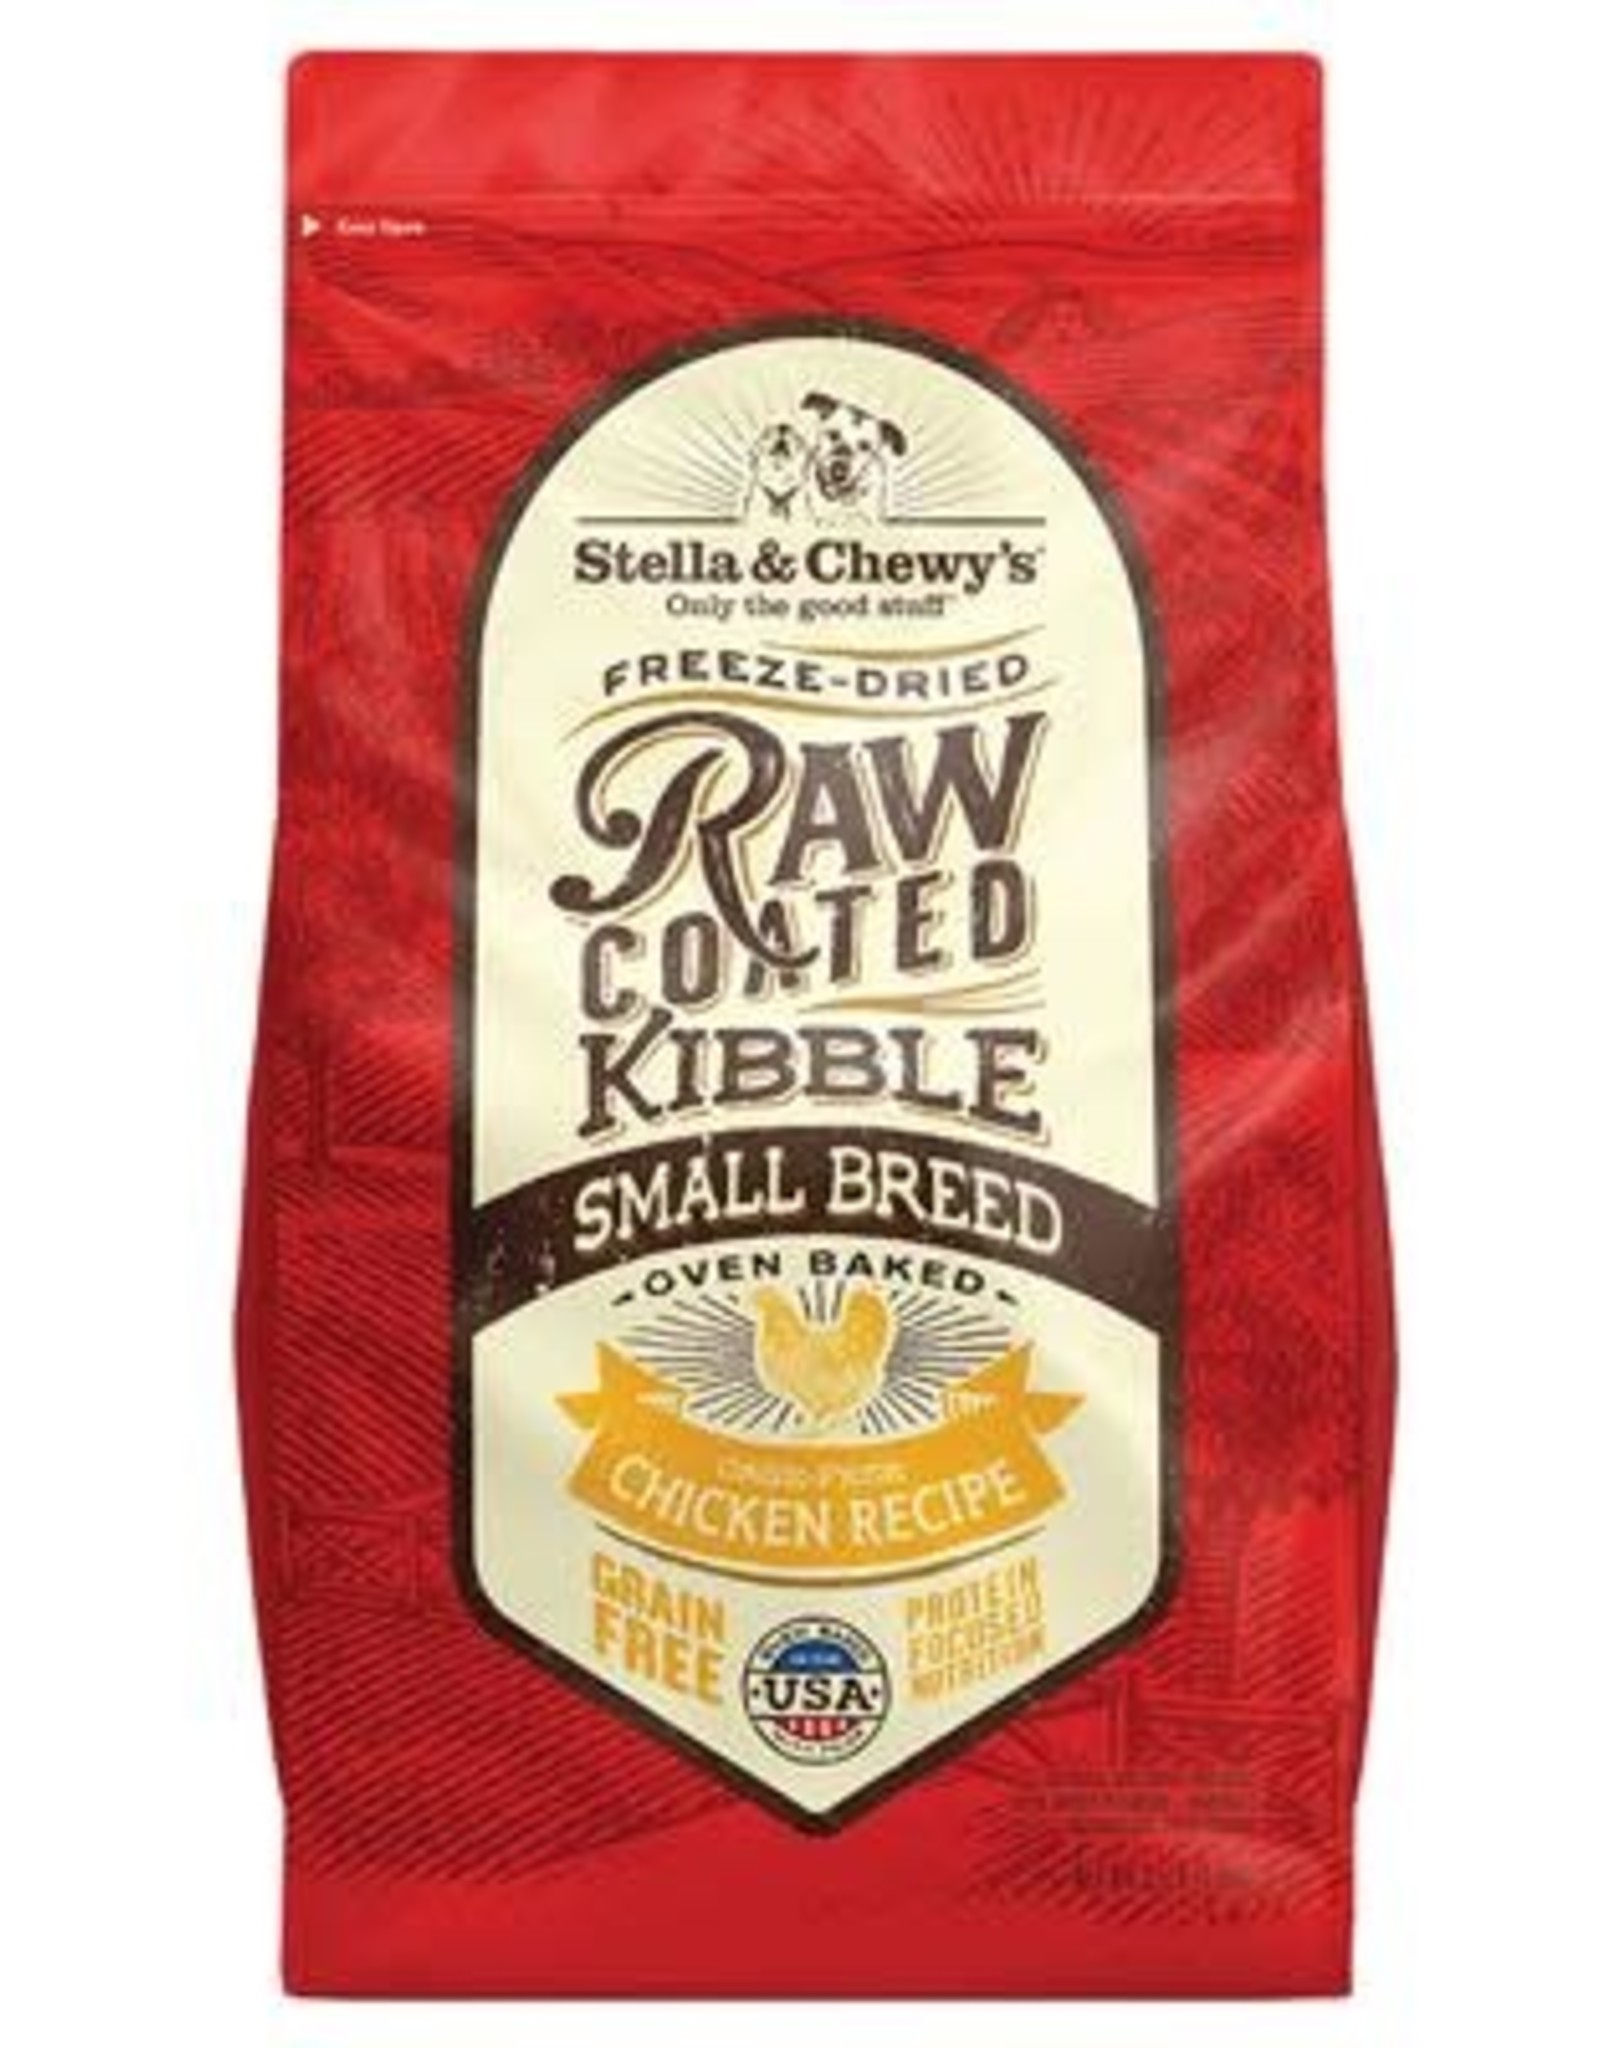 Stella & chewy's Stella & Chewy's  Grain Free Chicken  Small Breed 3LB